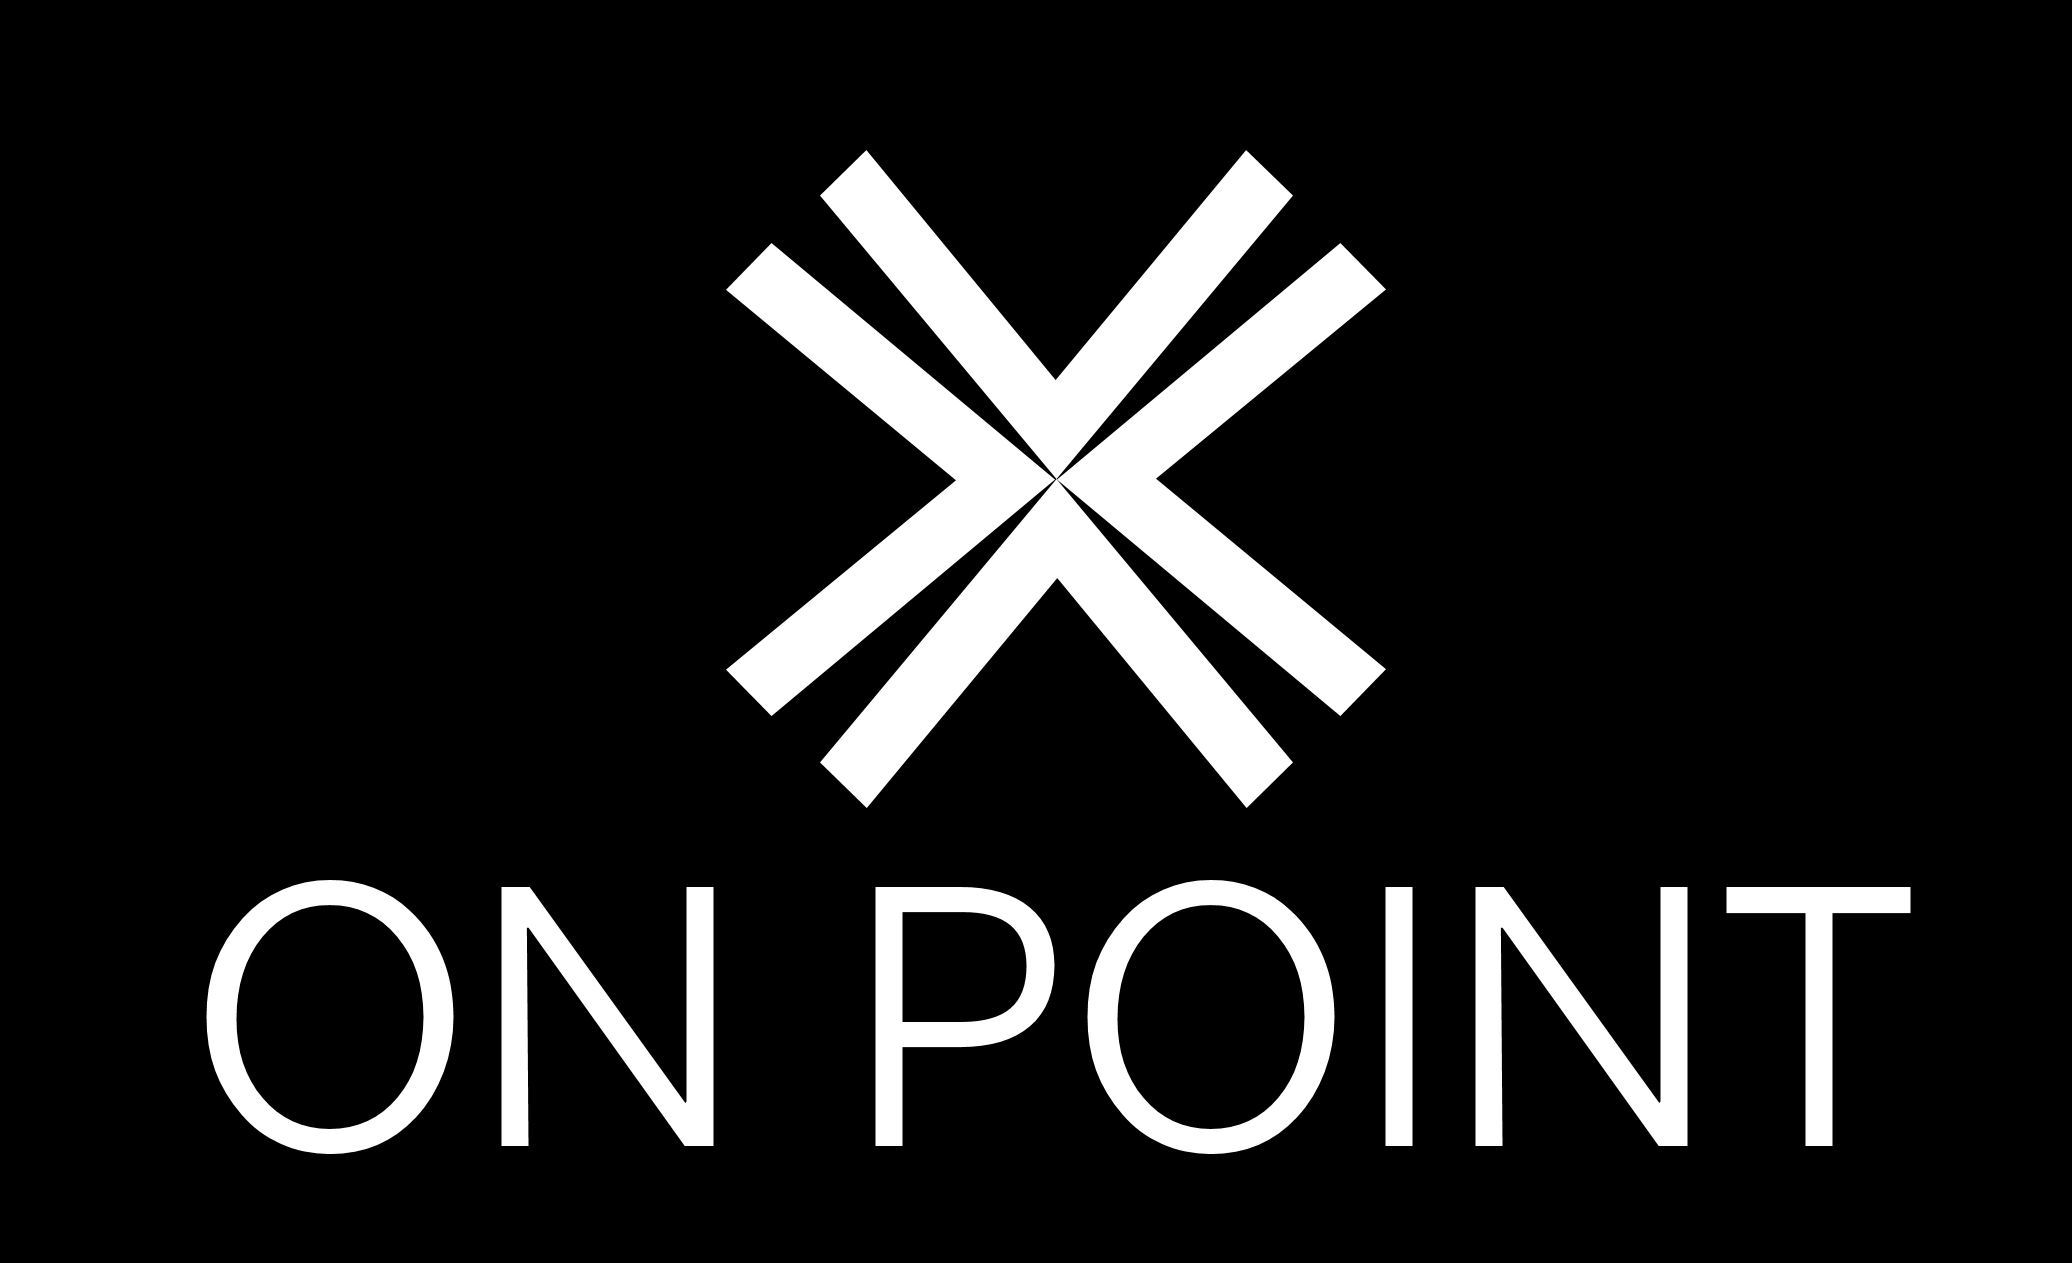 onpoint cross.jpg